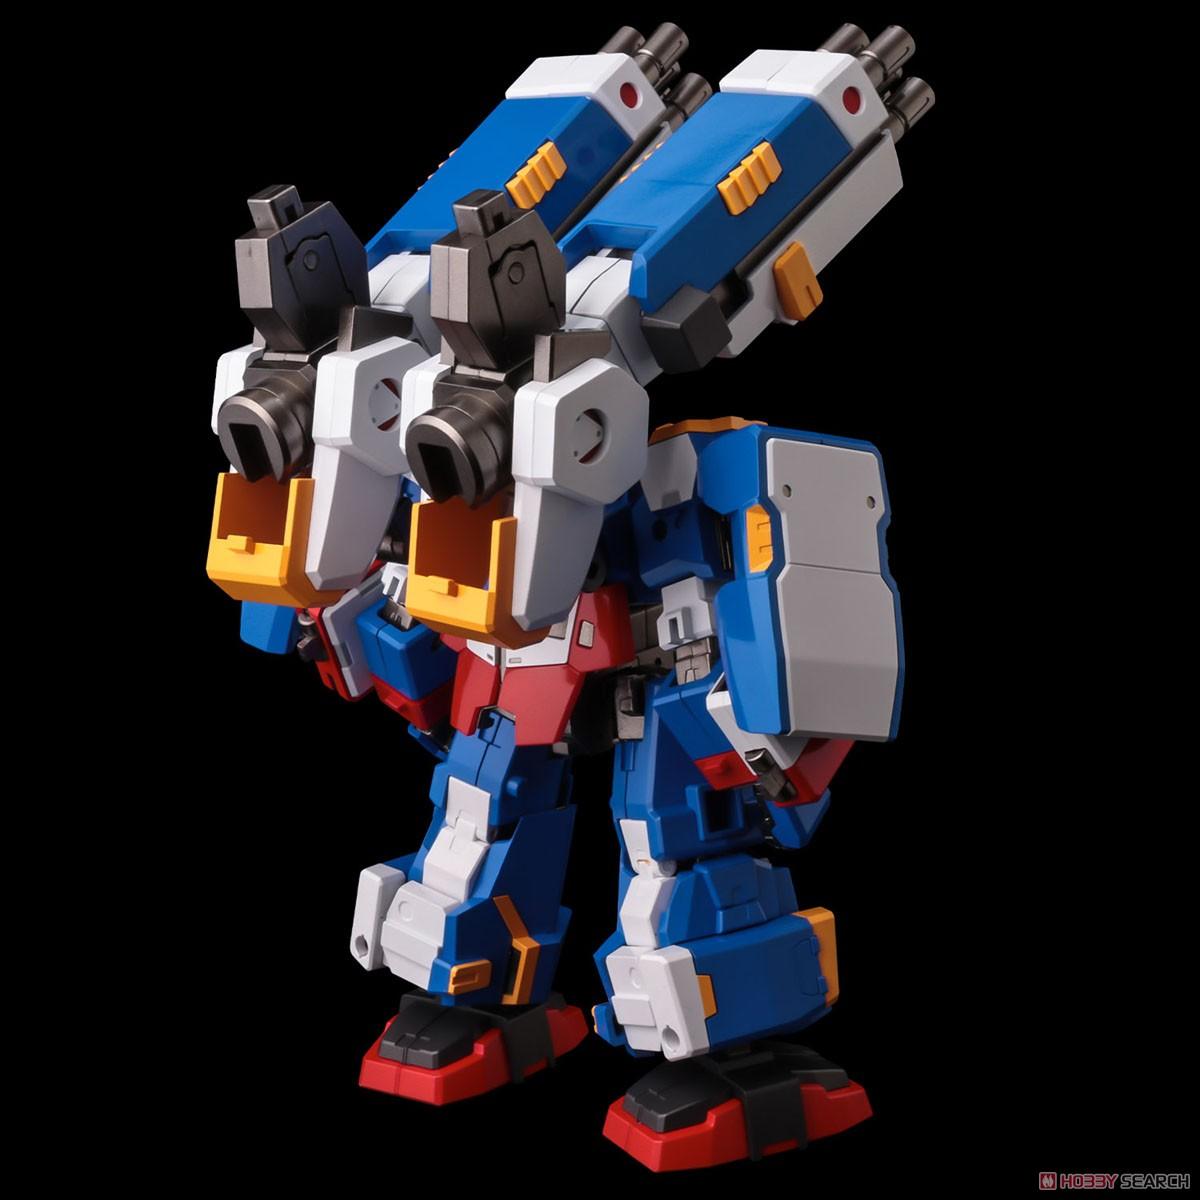 RIOBOT『変形合体 R-1』スーパーロボット大戦OG 可変合体フィギュア-018